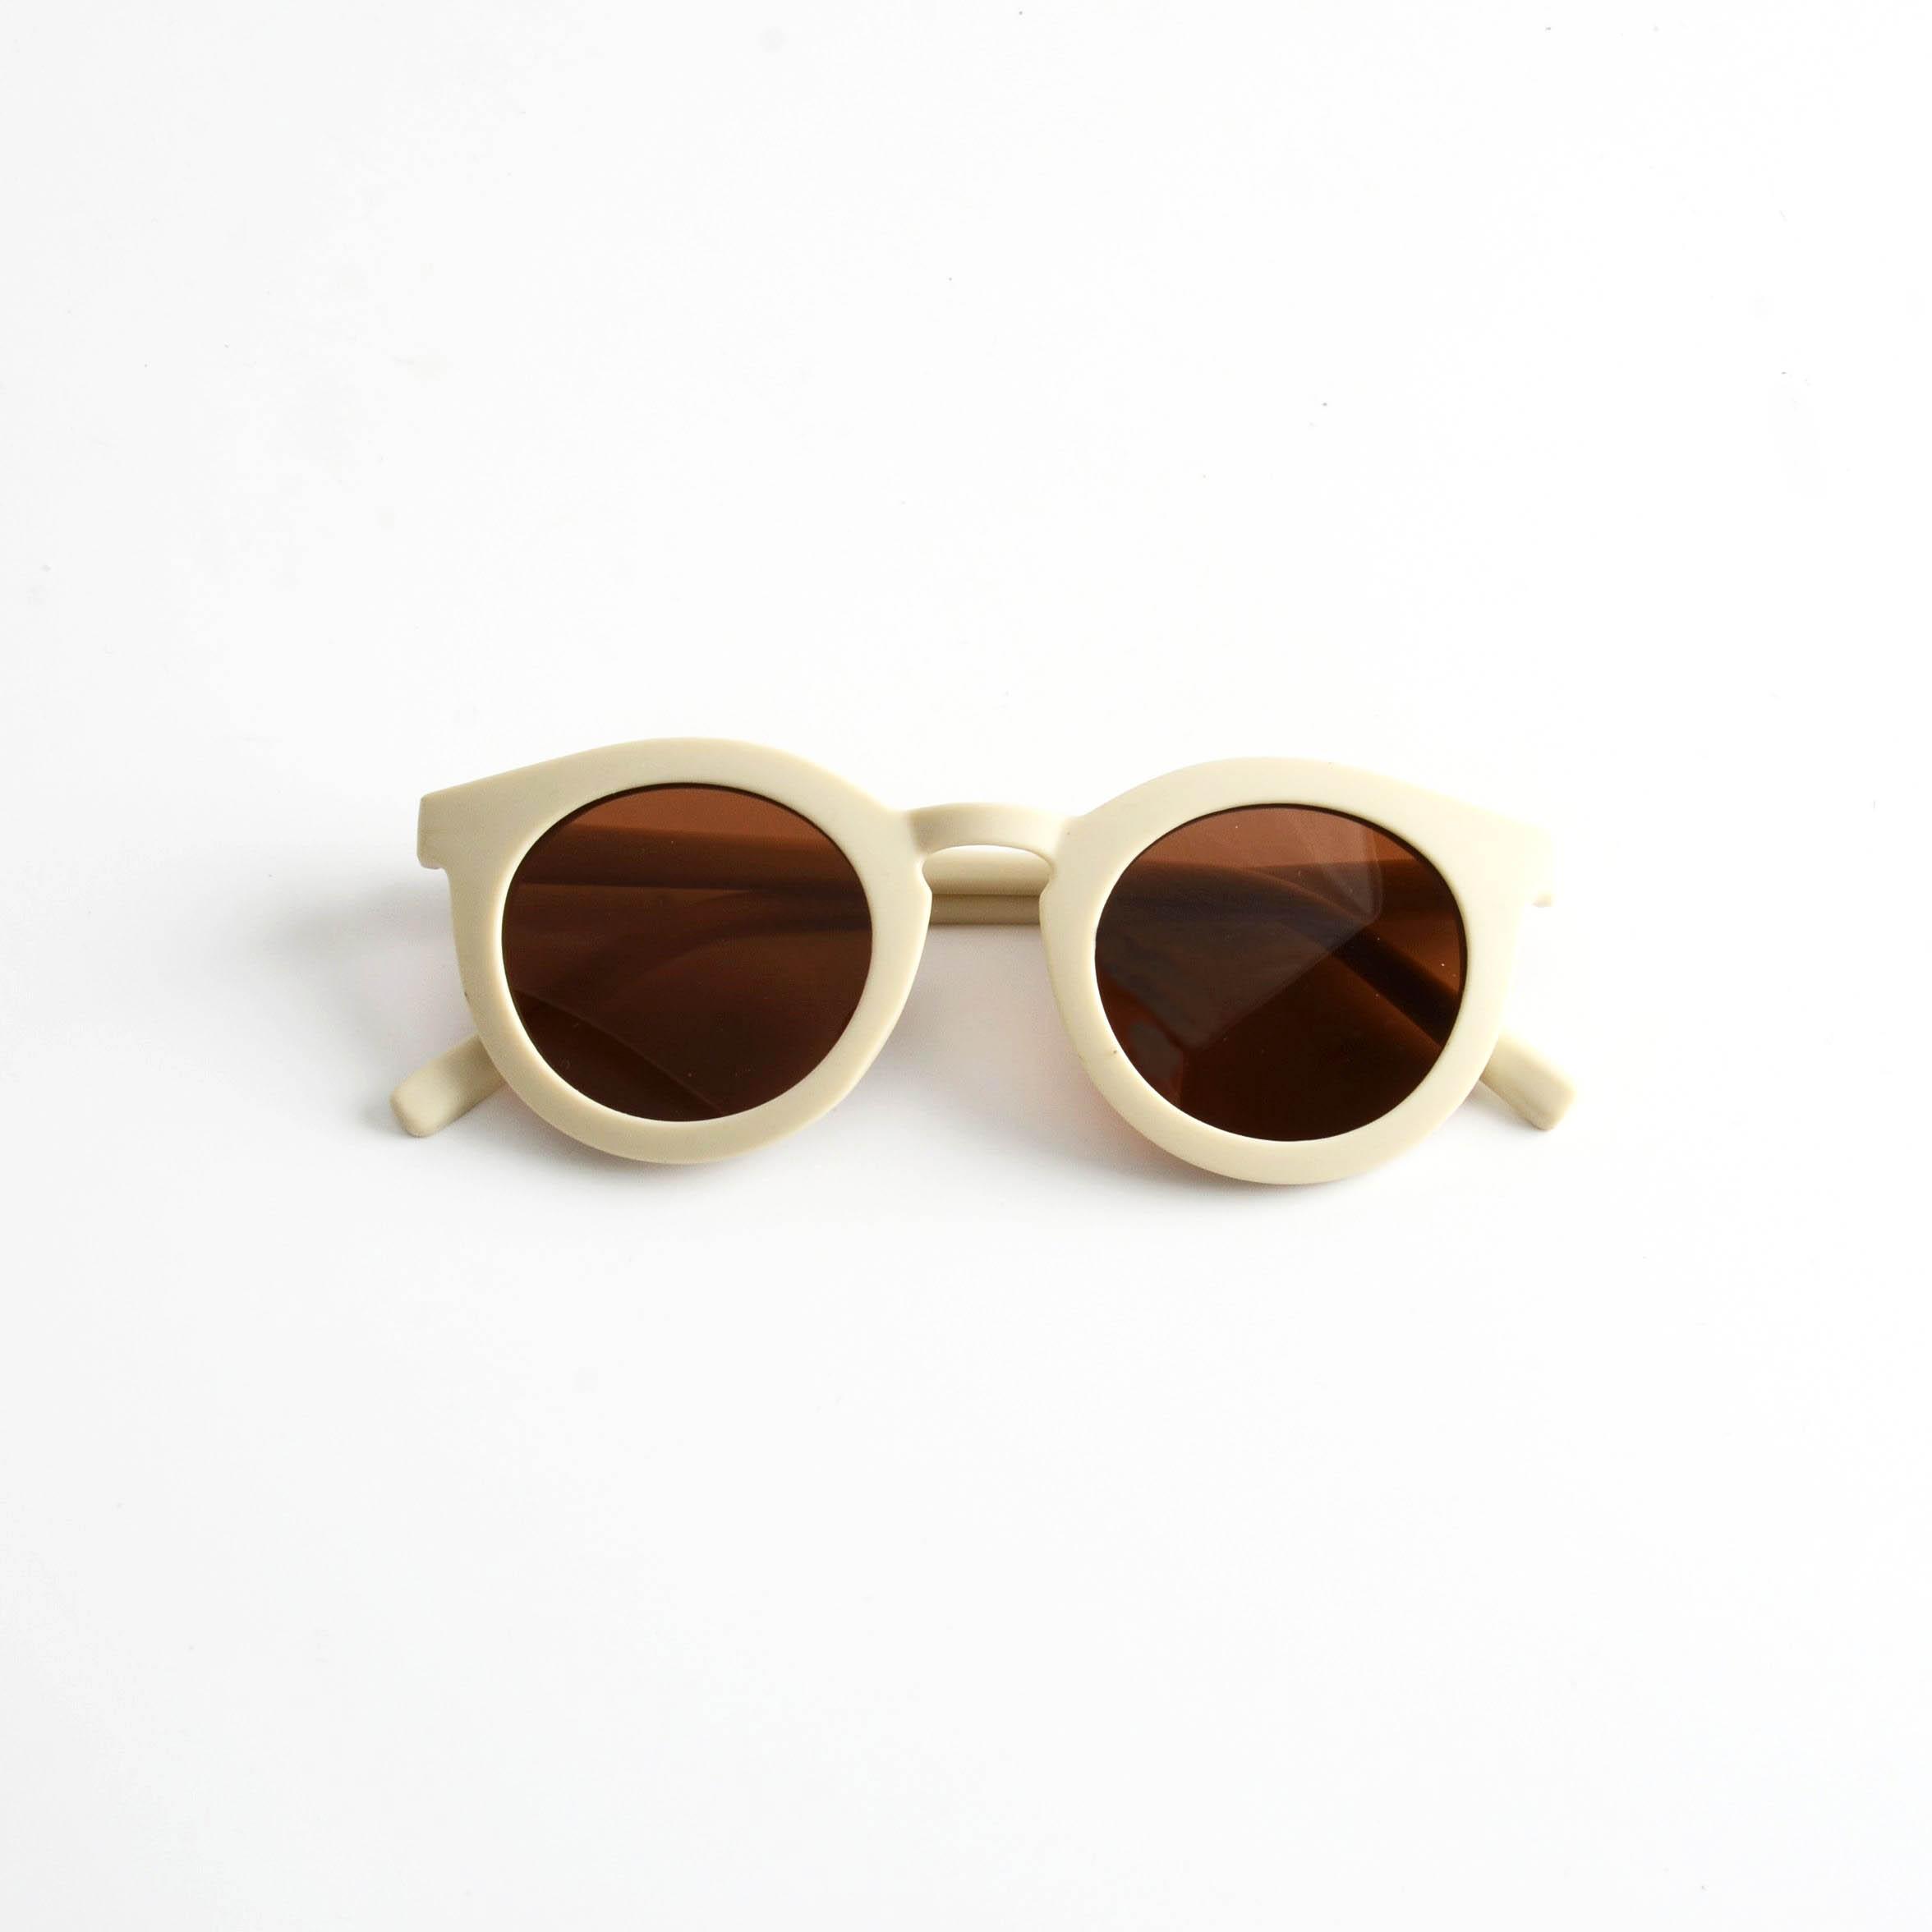 Sunglasses Buff  12.5cm  x 14cm